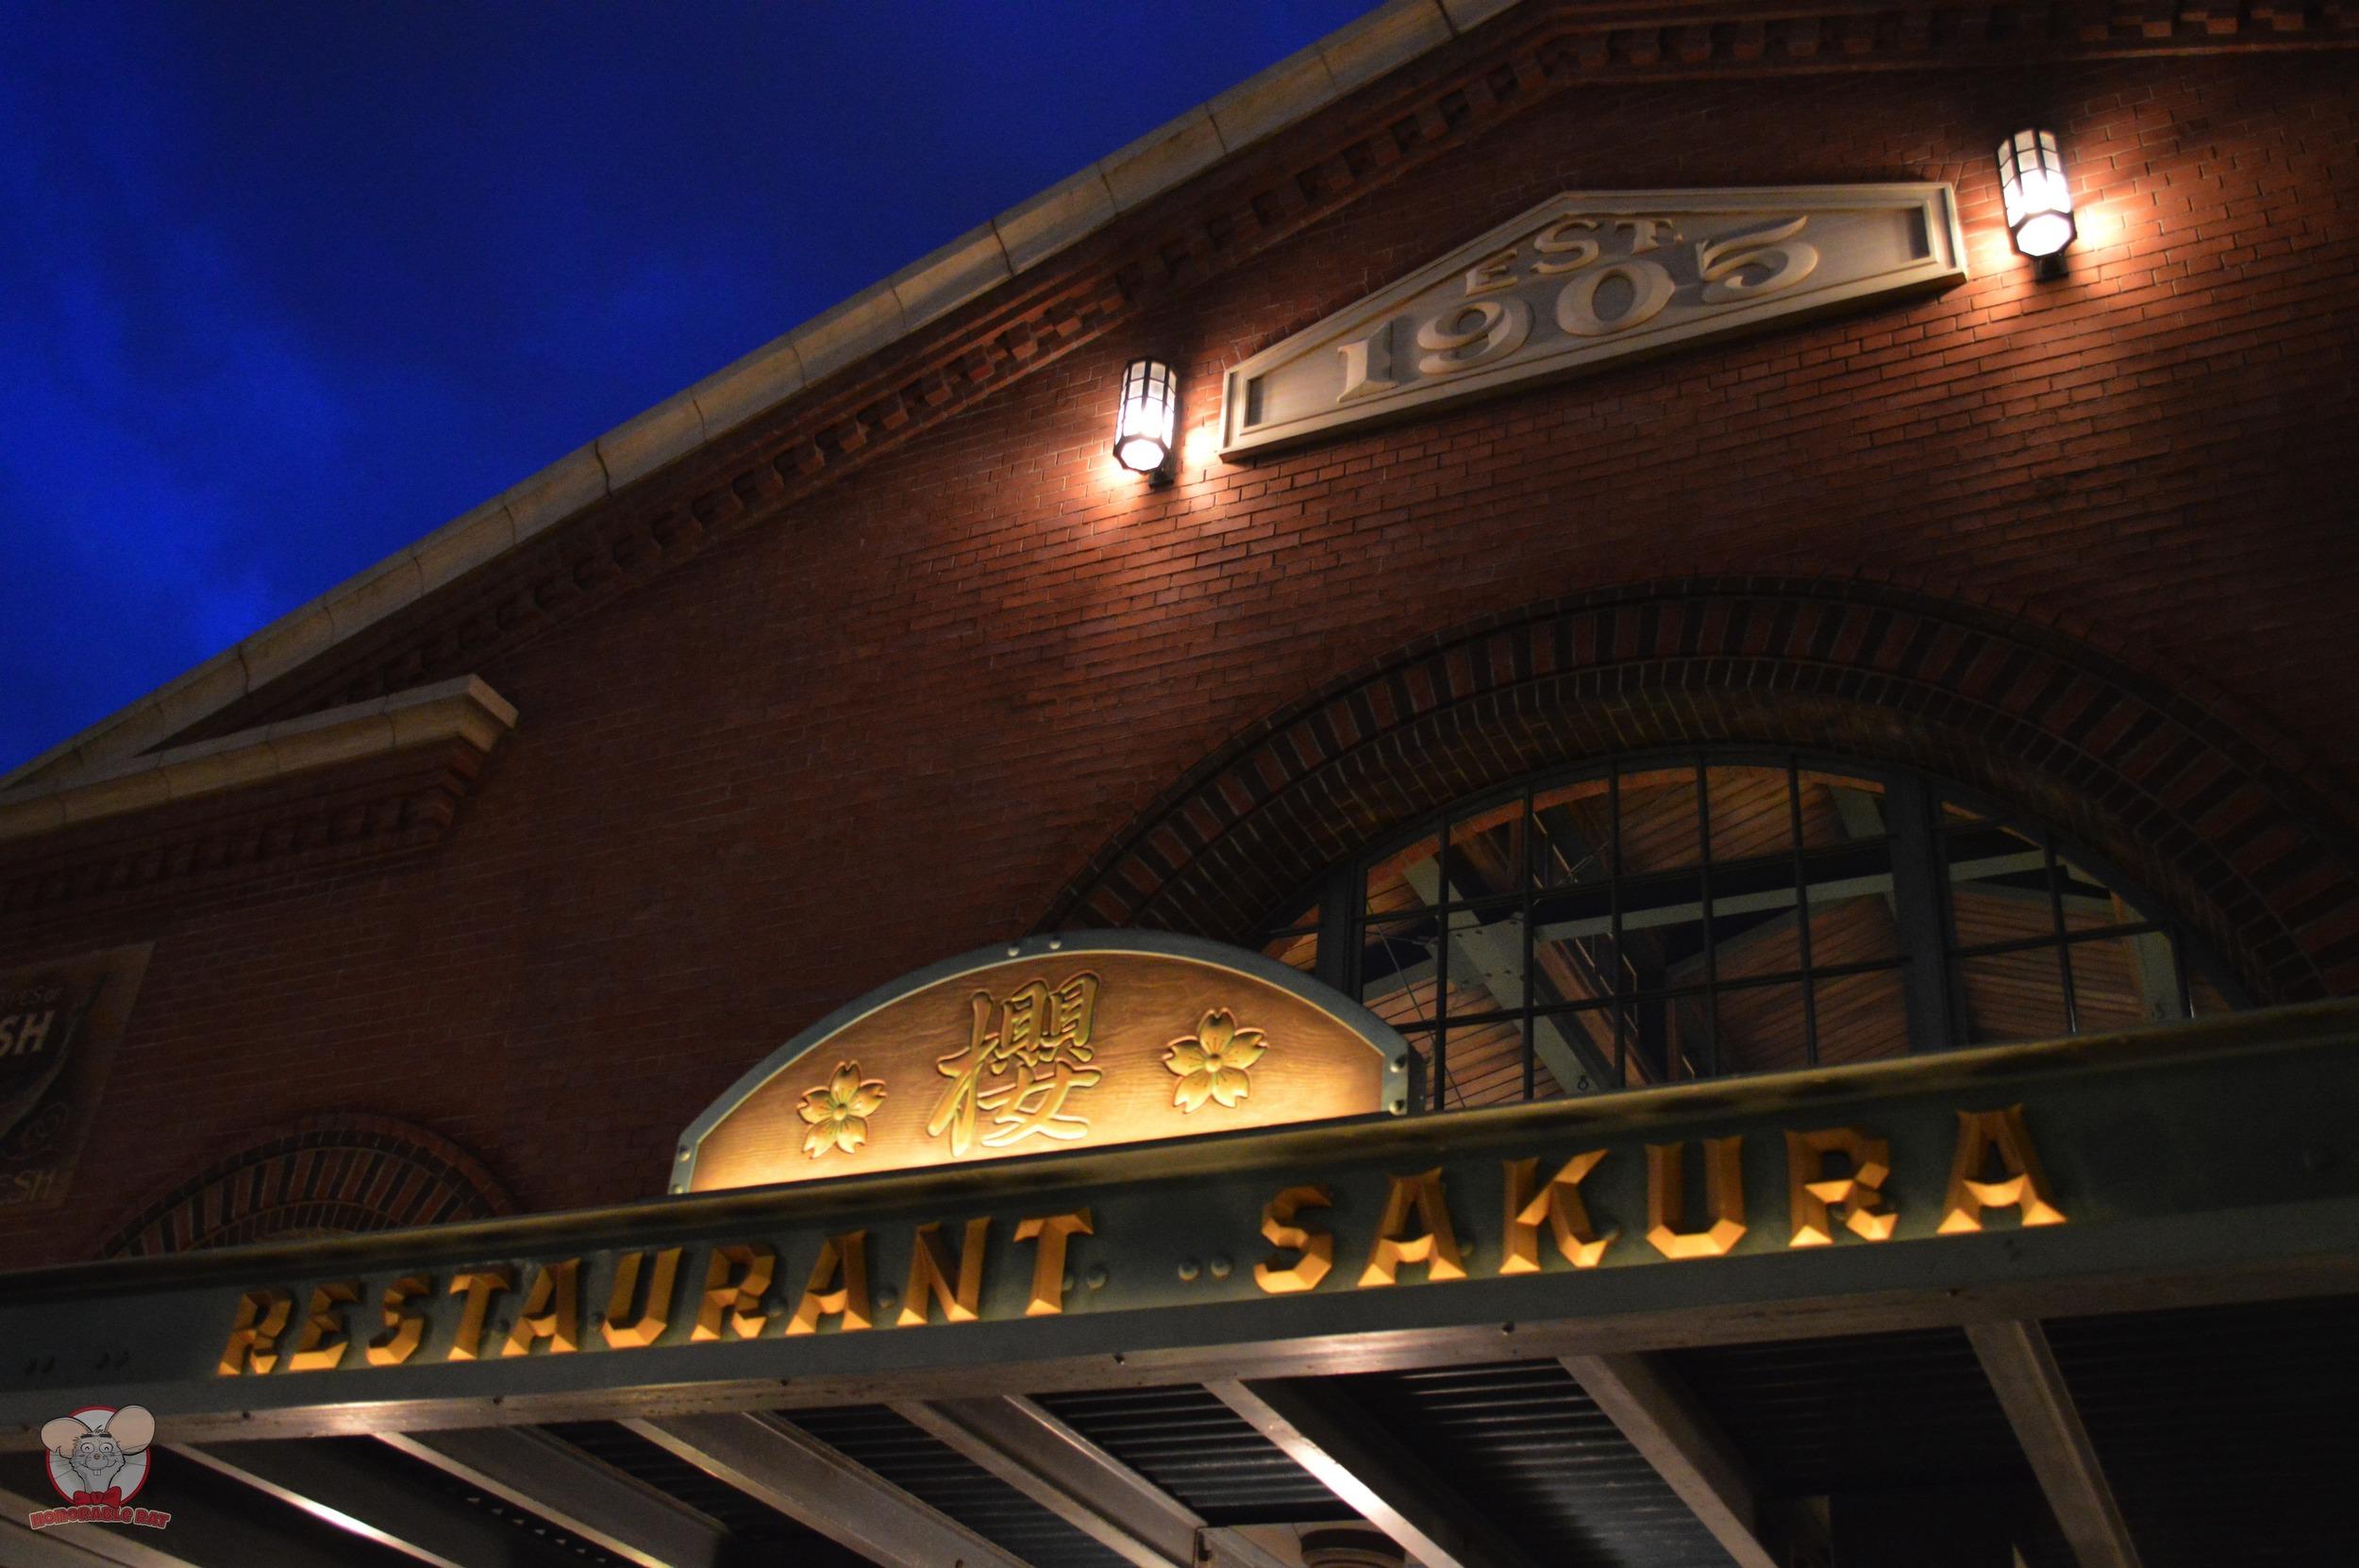 Restaurant Sakura Signage